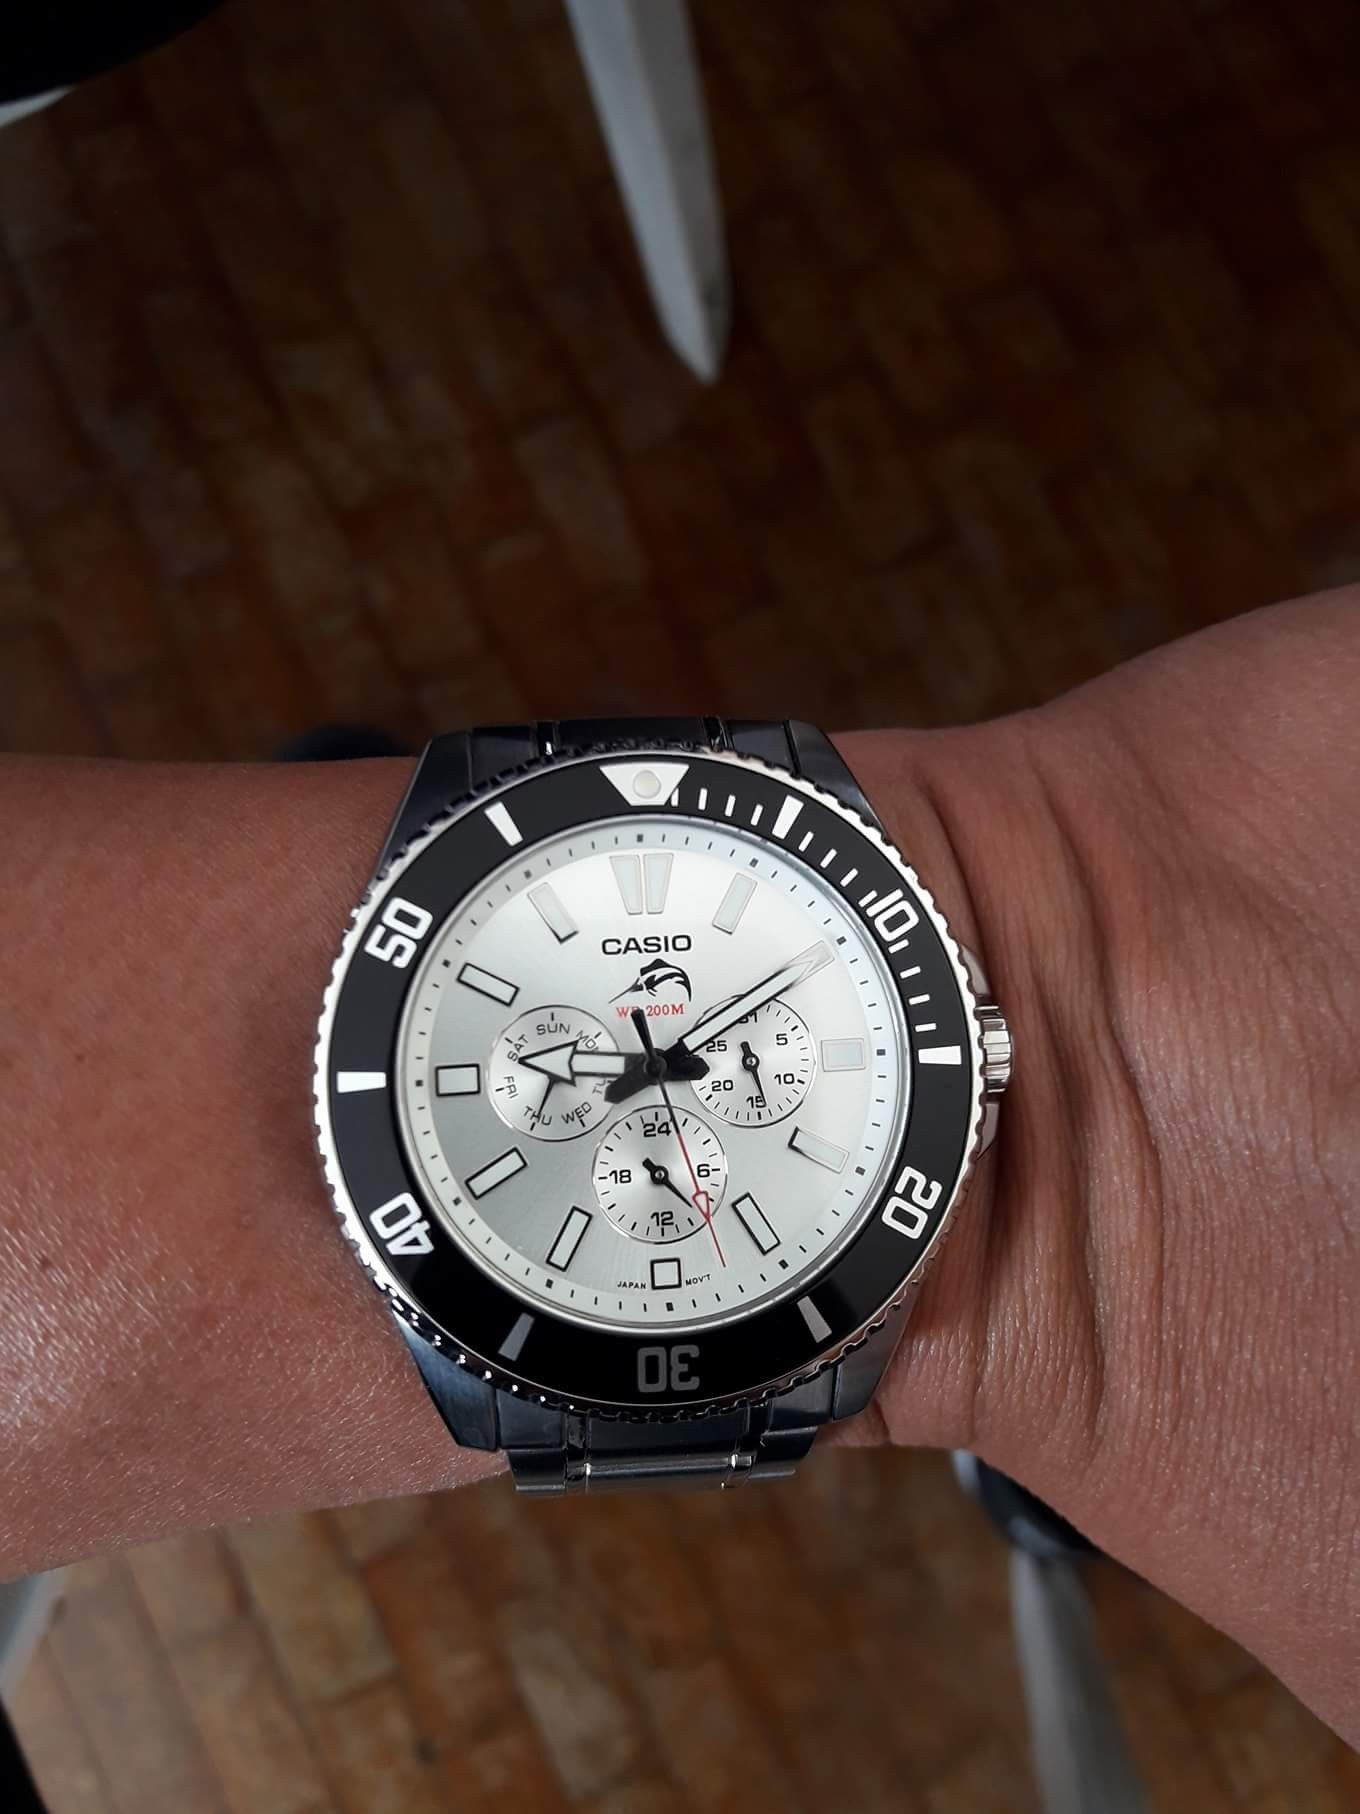 a11b7077a0f Casio Duro 200 MDV-303 Sunburst White dial